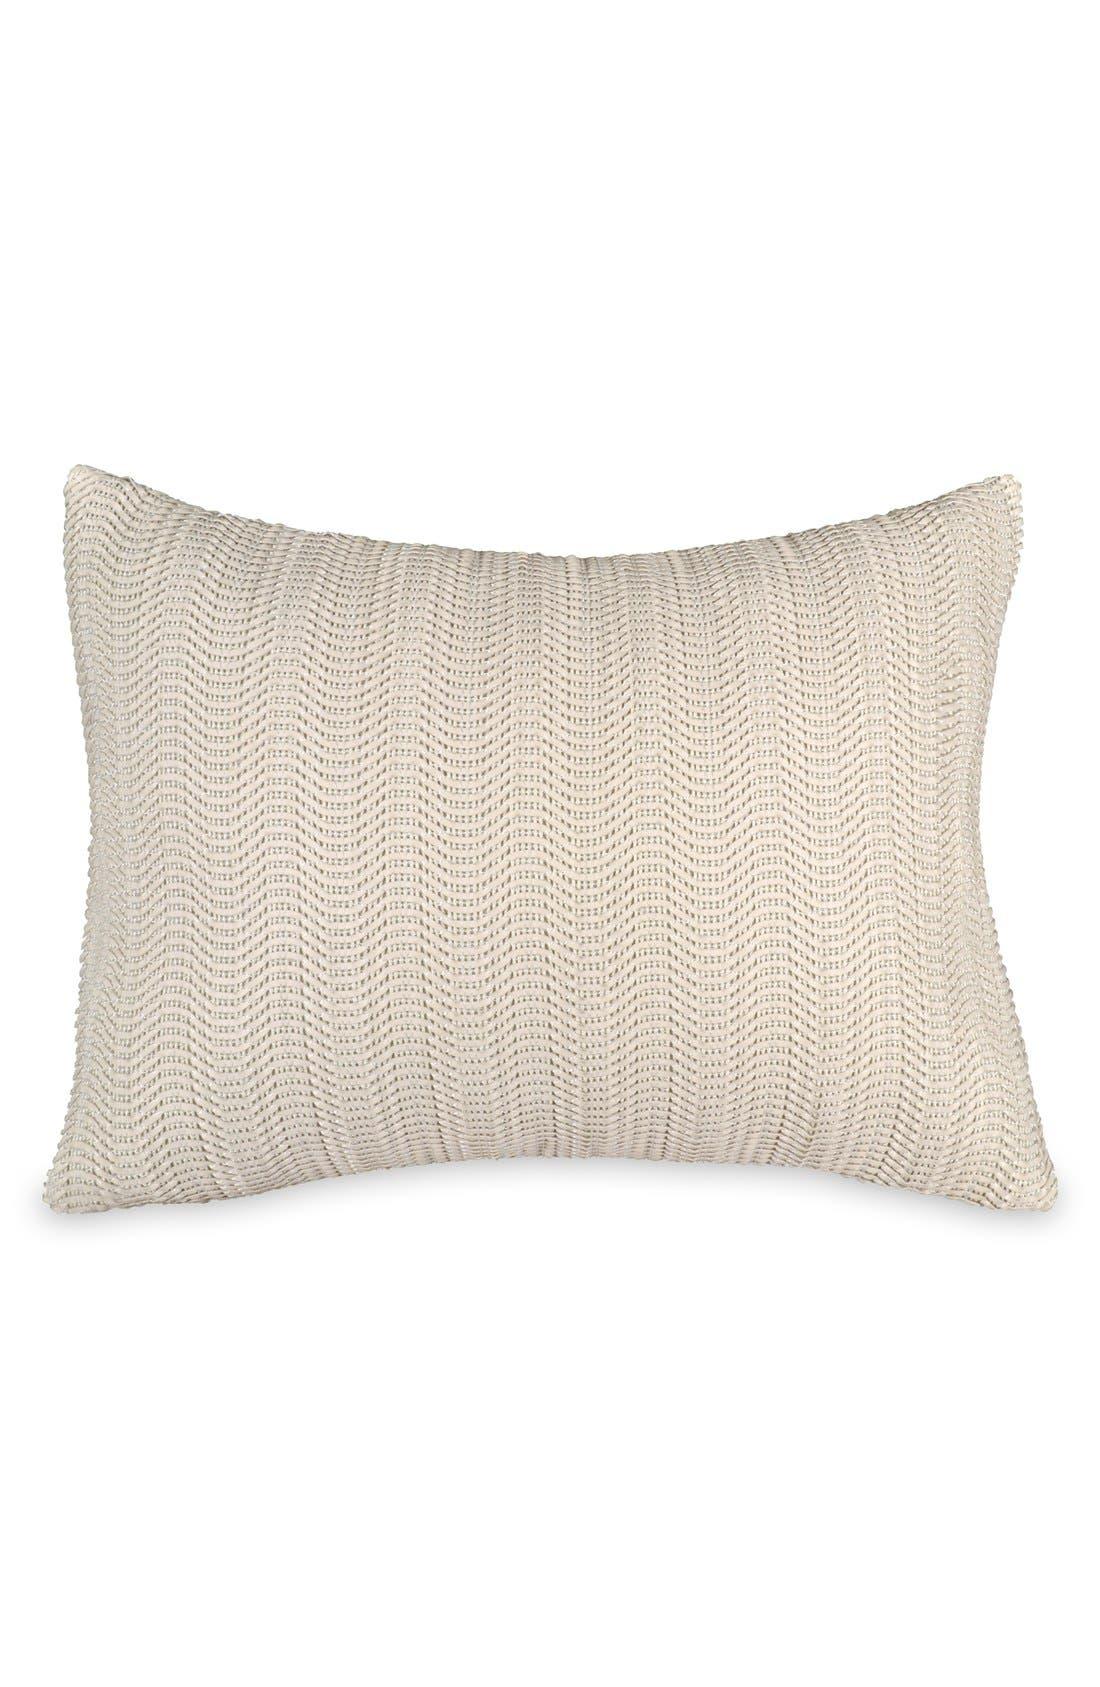 Main Image - Donna Karan Collection 'Moonscape' Woven Pillow